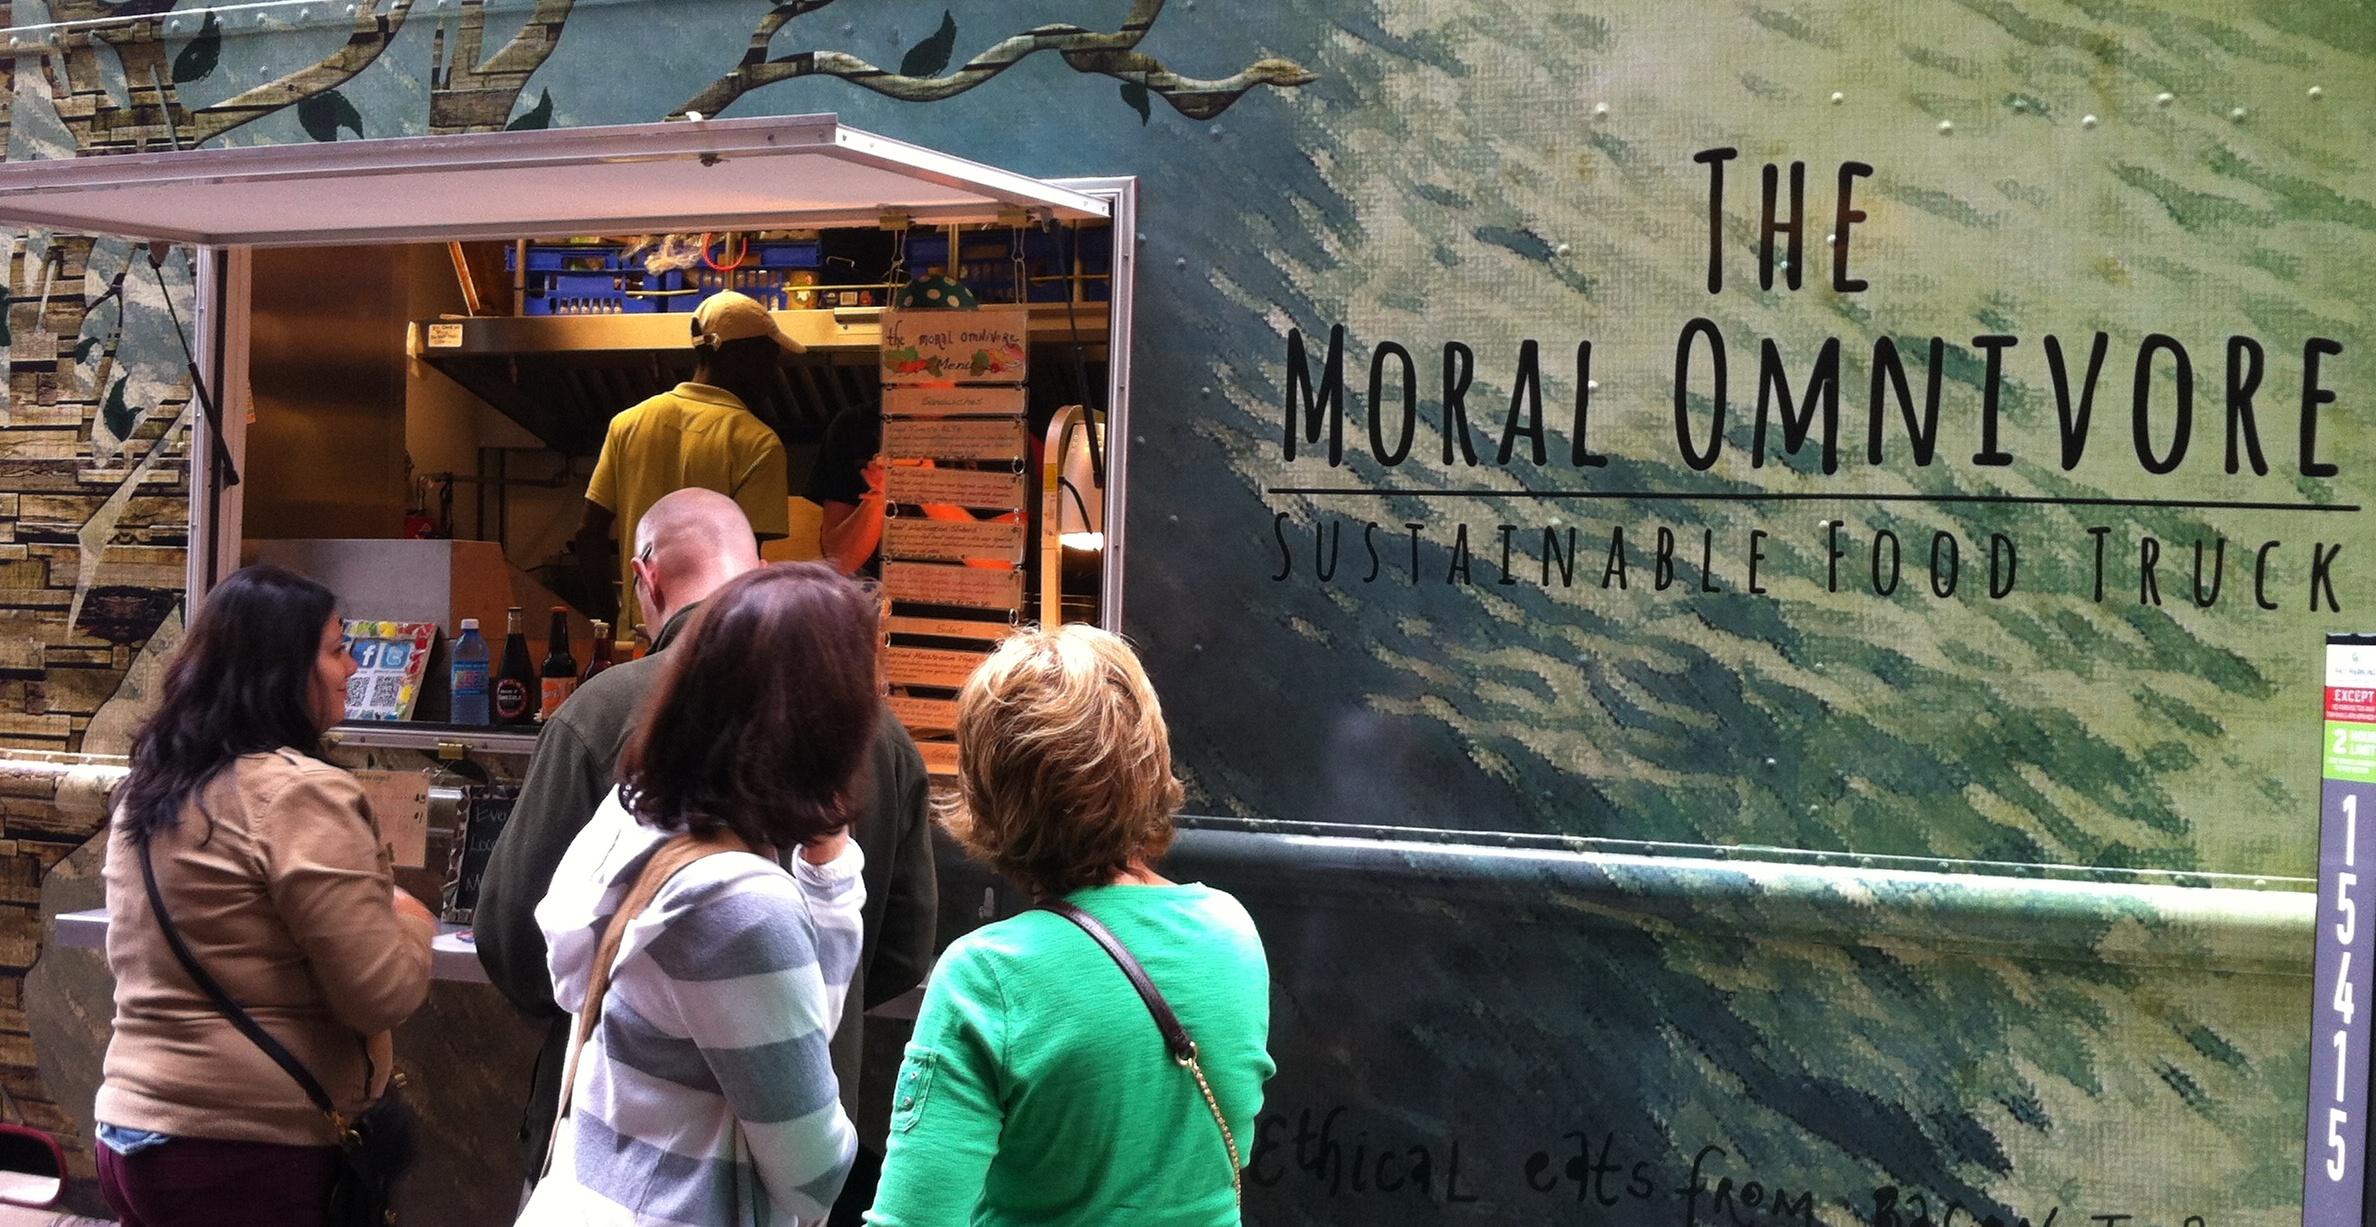 Moral-Omnivore.jpg